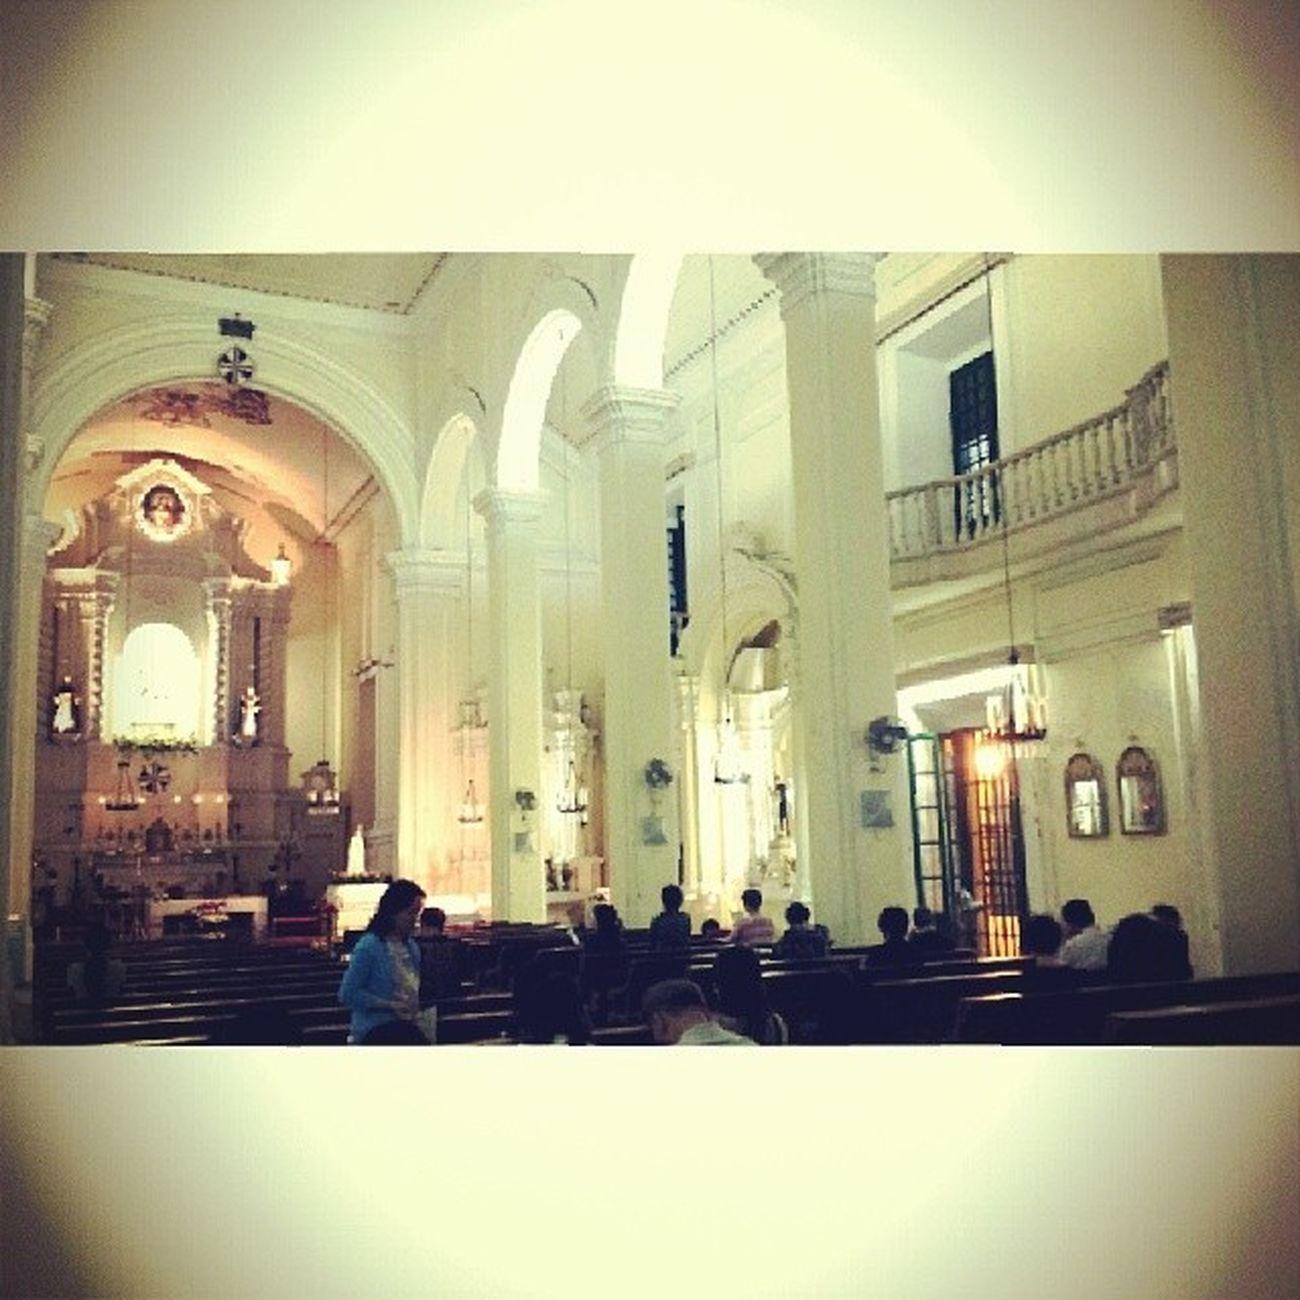 Interior Catholic Church 16th century baroque stylest dominic's Macau